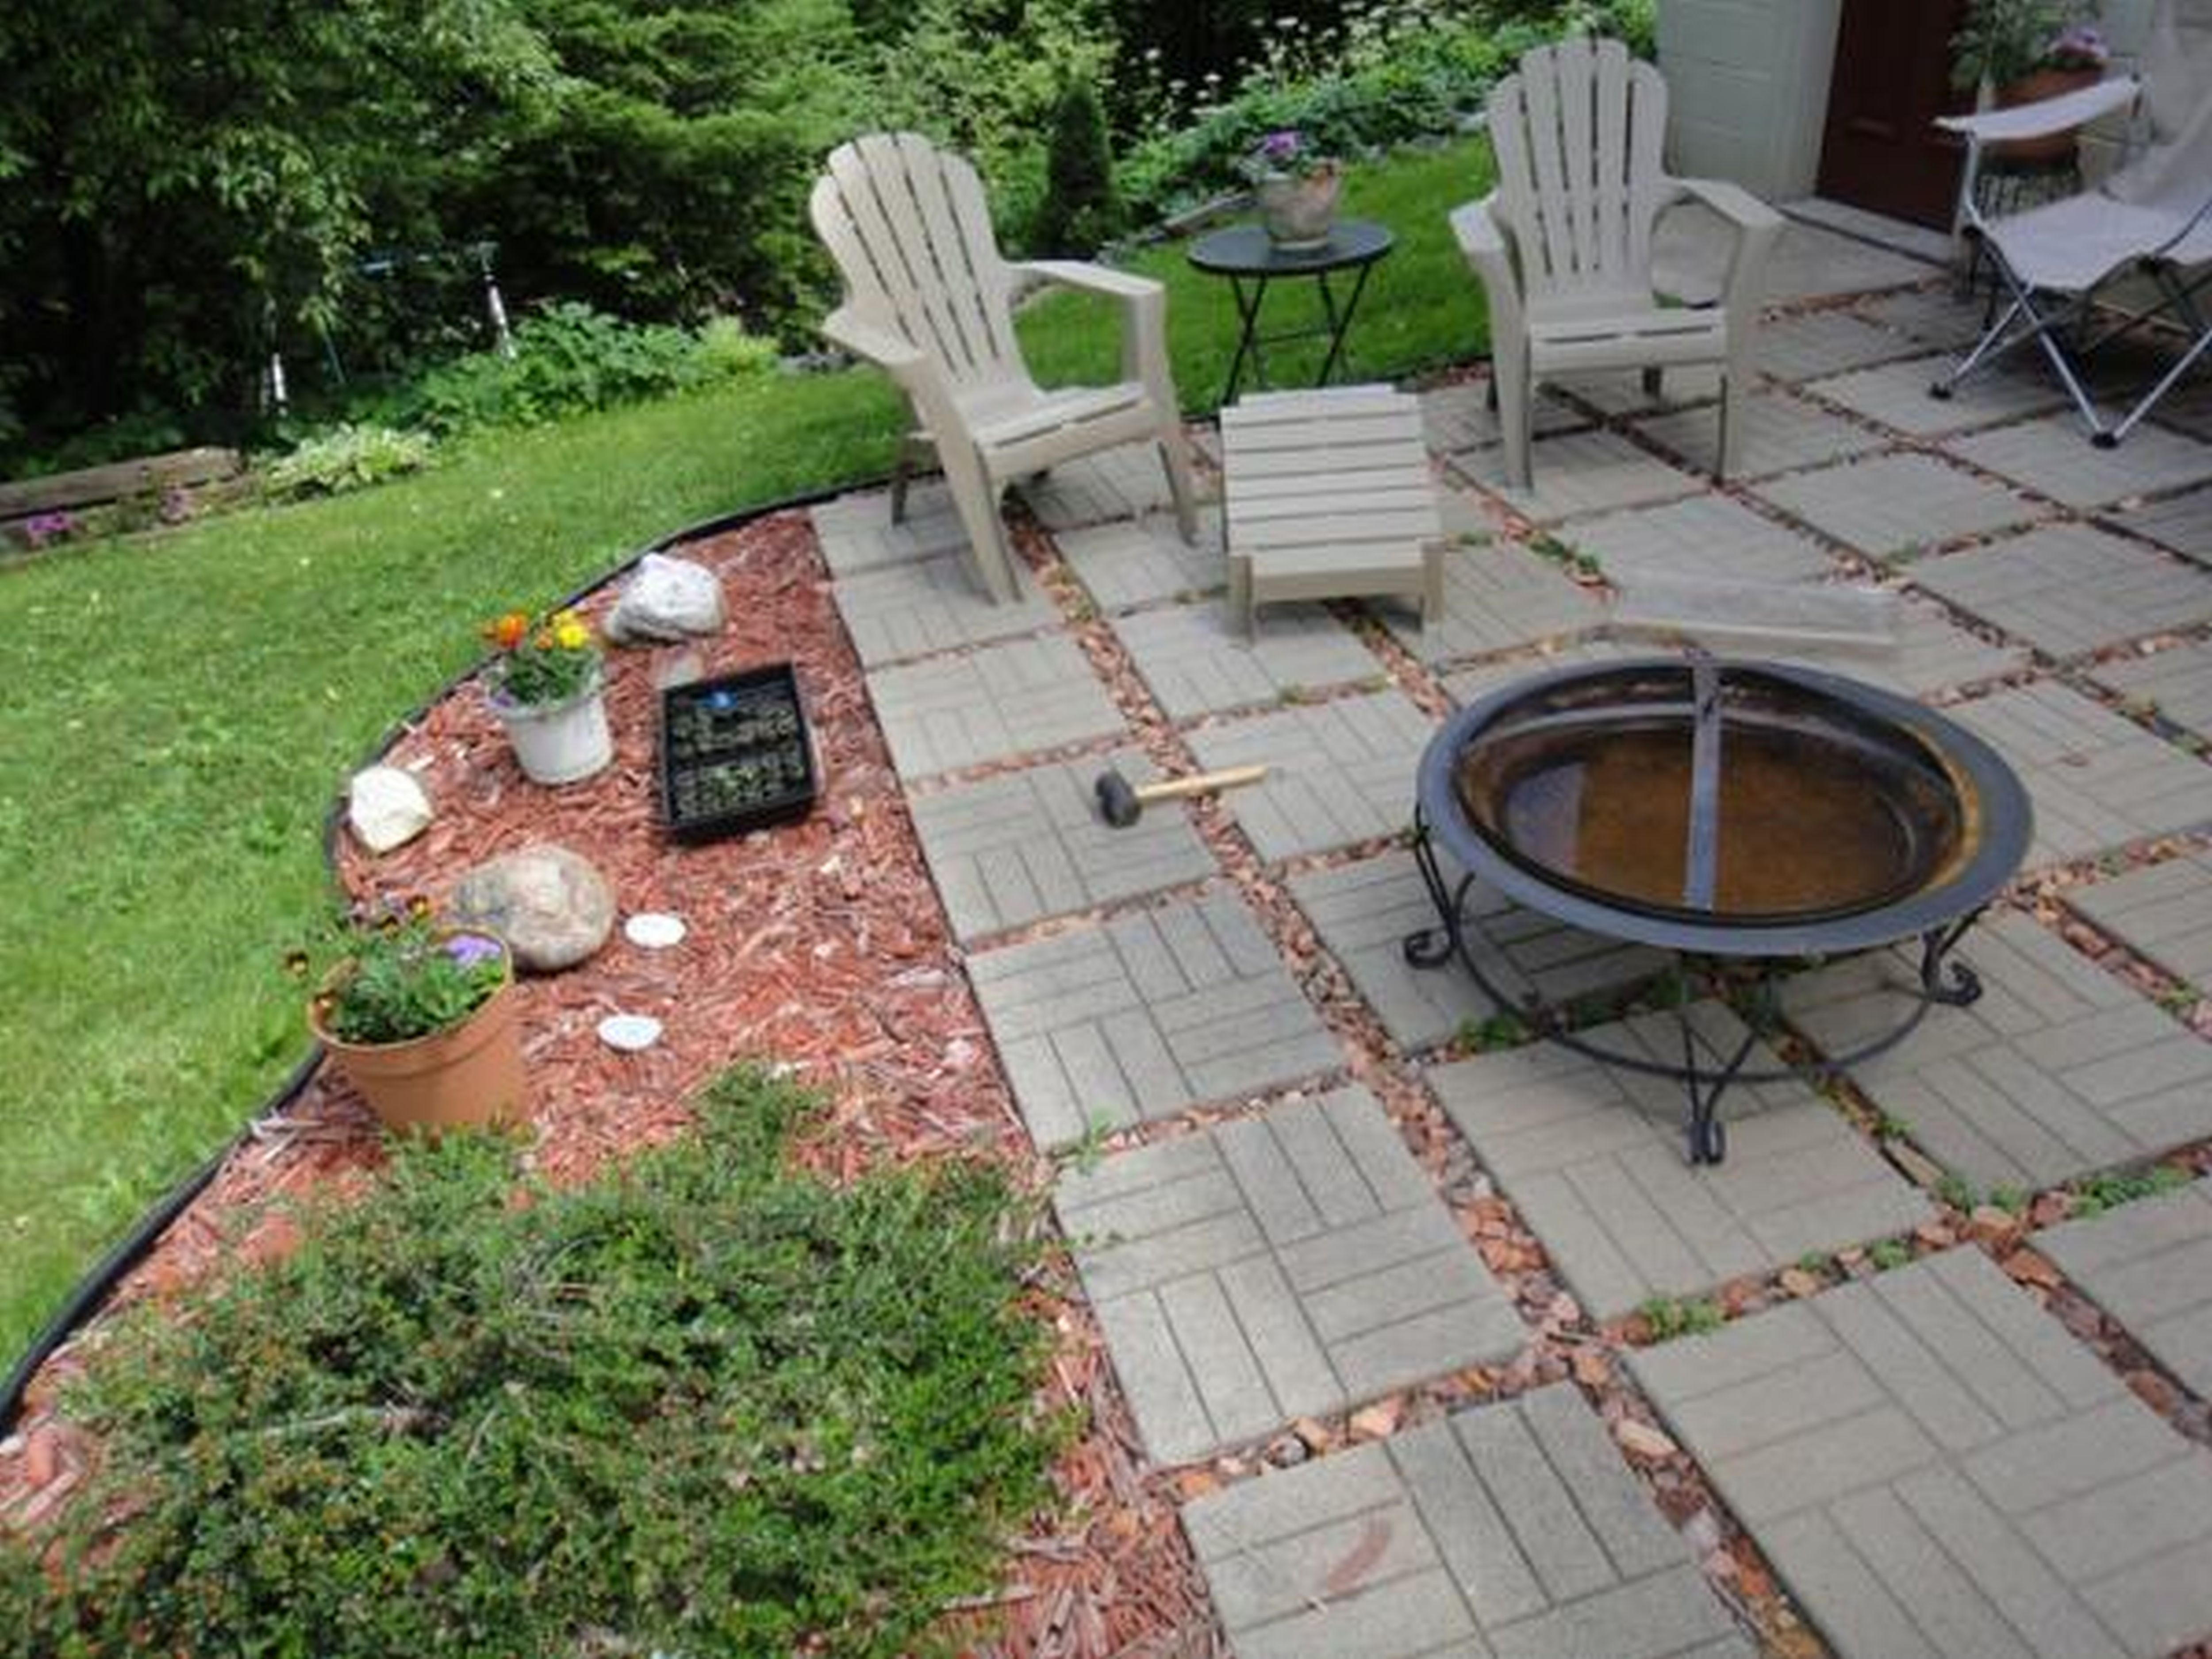 Captivating Landscaping Ideas For Front Yard Object Handsome Driveway Landscapi Backyard Landscaping Designs Cheap Landscaping Ideas Small Backyard Landscaping